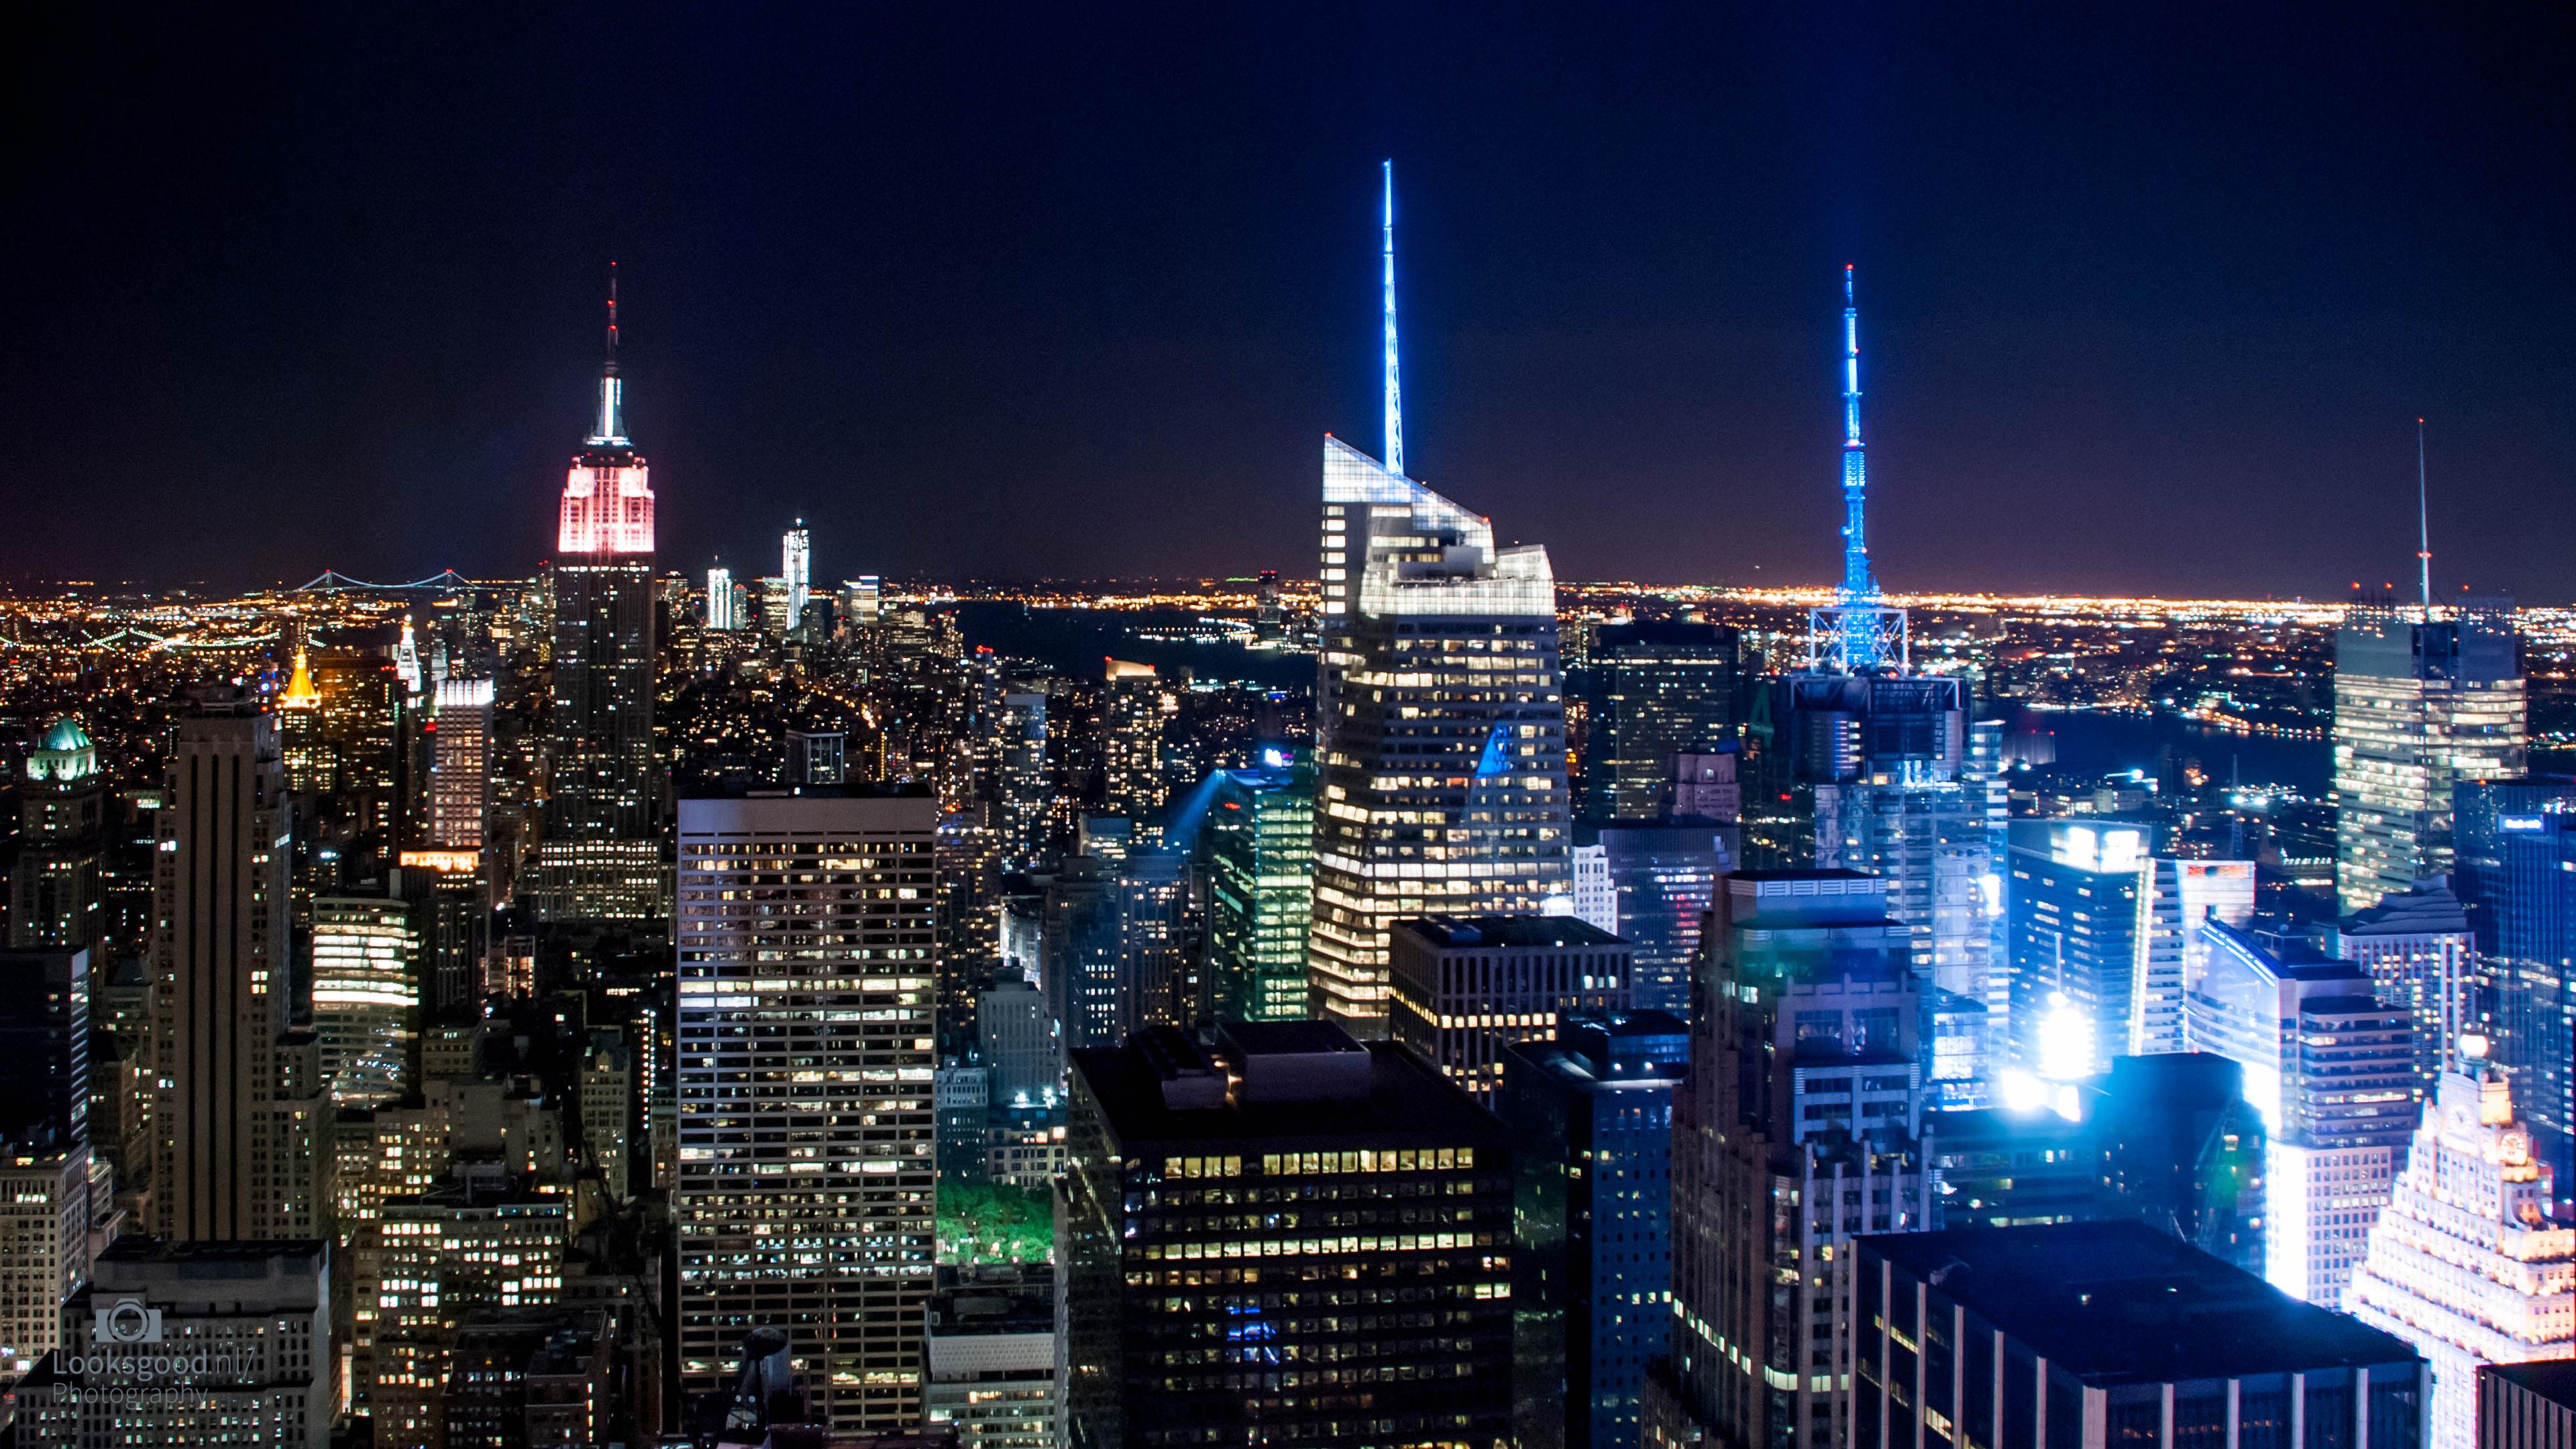 New York Skyline at night 4K Wallpaper Desktop Background Flickr 3840x2160